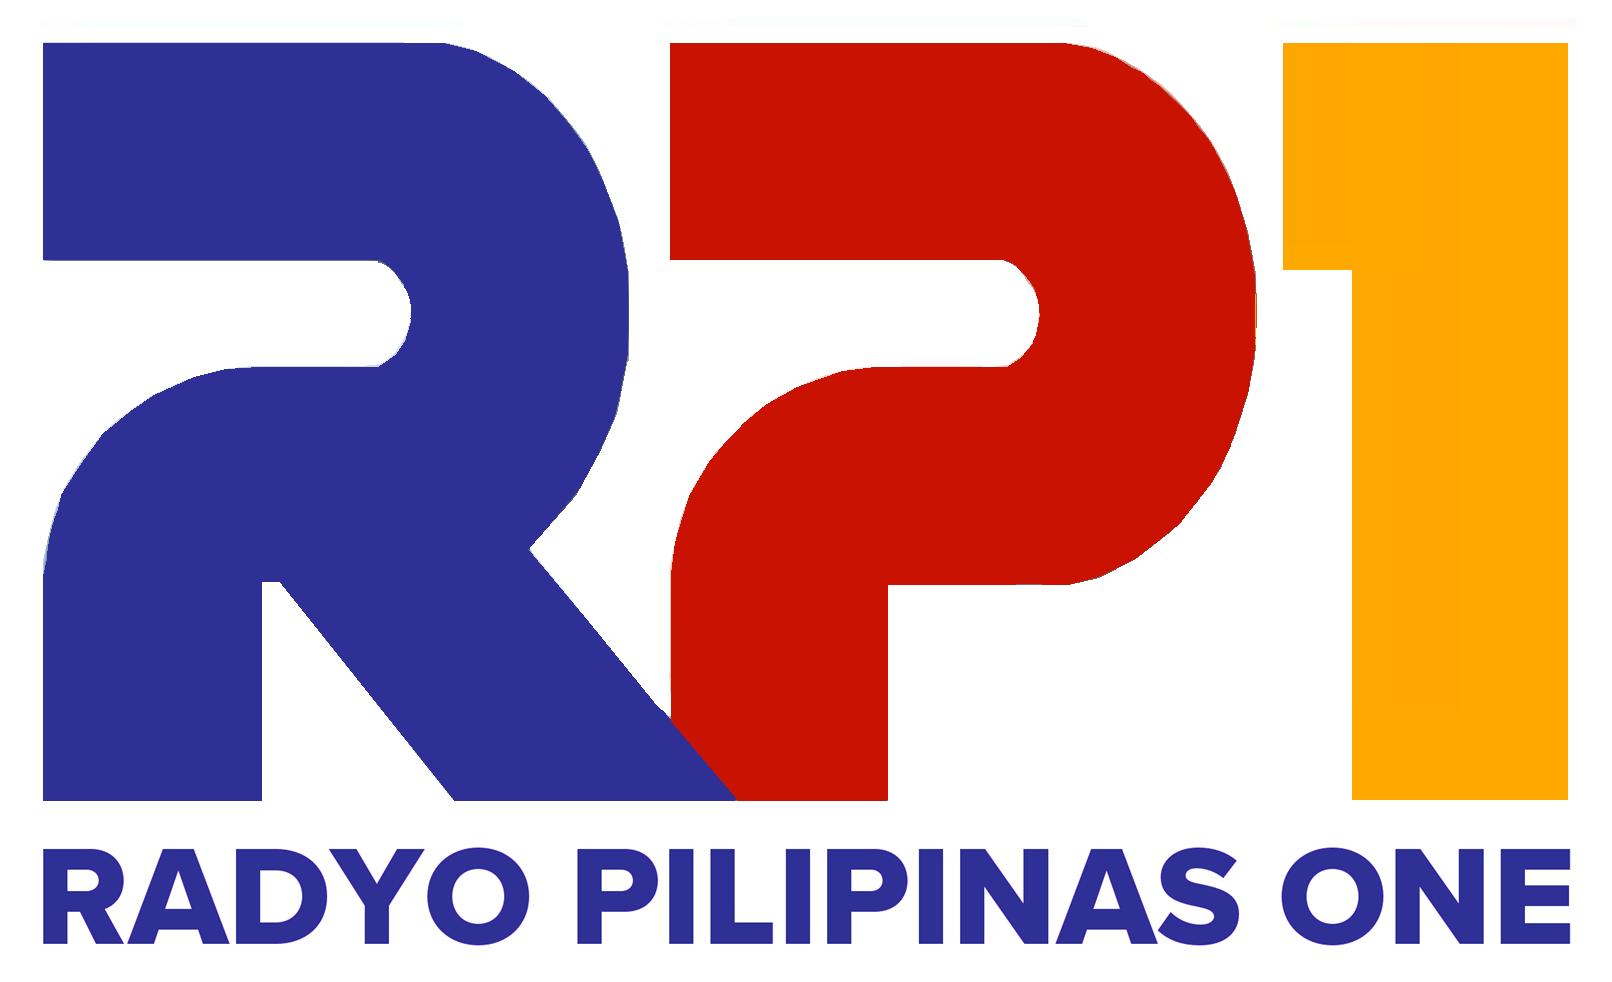 RP1-LOGO-2017-RADYO-PILIPINAS-ONE.png